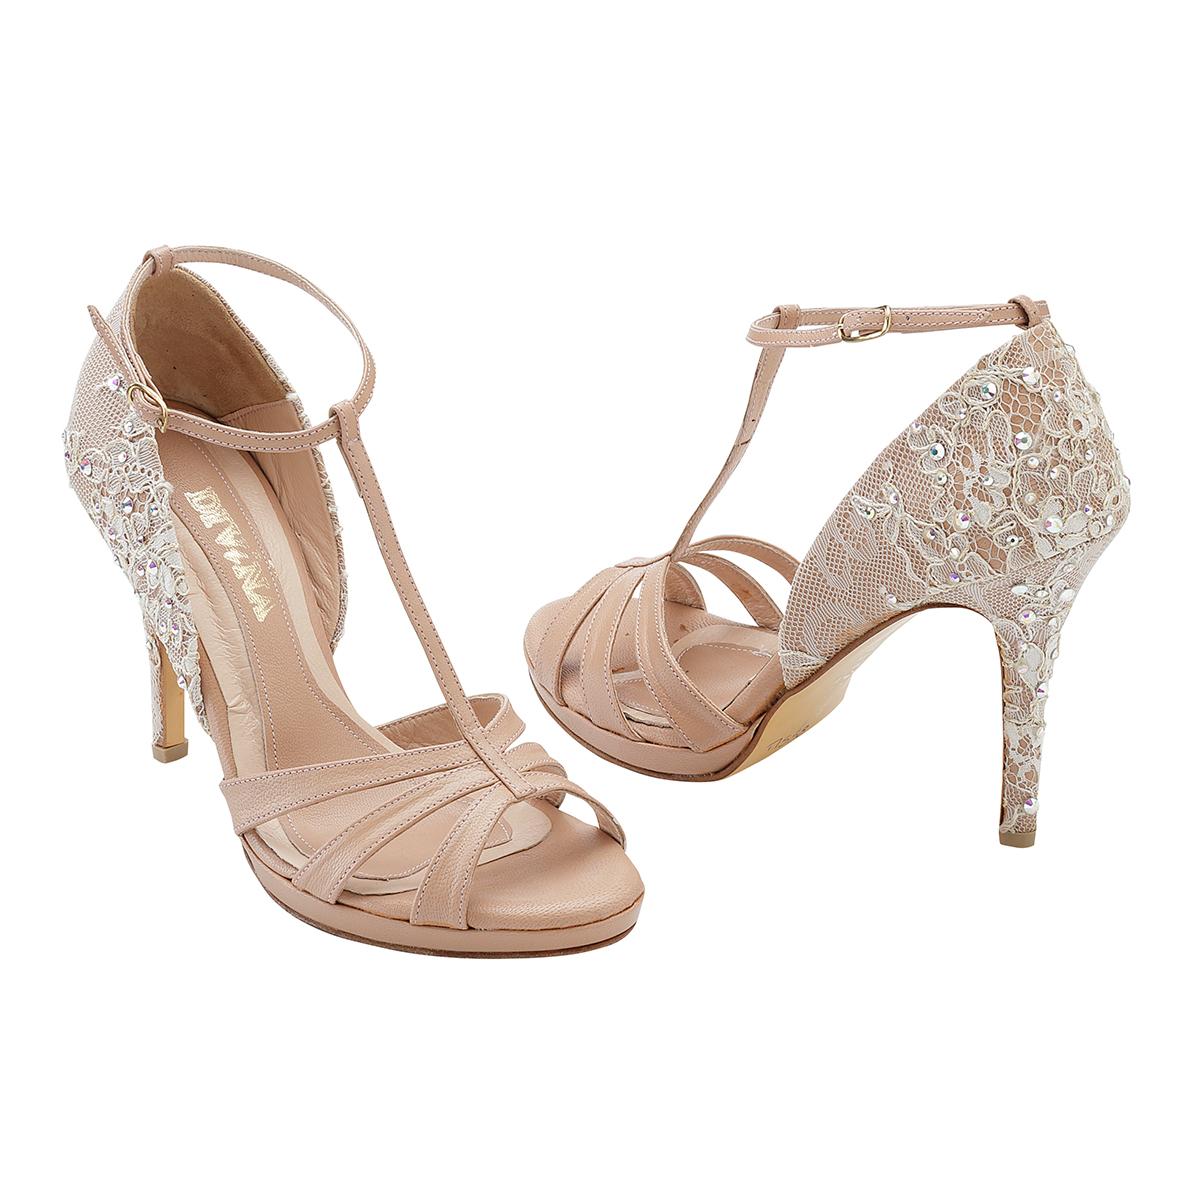 1772f14854c Αν τώρα θέλεις να κάνεις έναν ρομαντικό γάμο και ψάχνεις τα ιδανικά  παπούτσια που μπορείς να συνδυάσεις με ένα νυφικό με δαντέλα ή ένα boho  νυφικό, ...